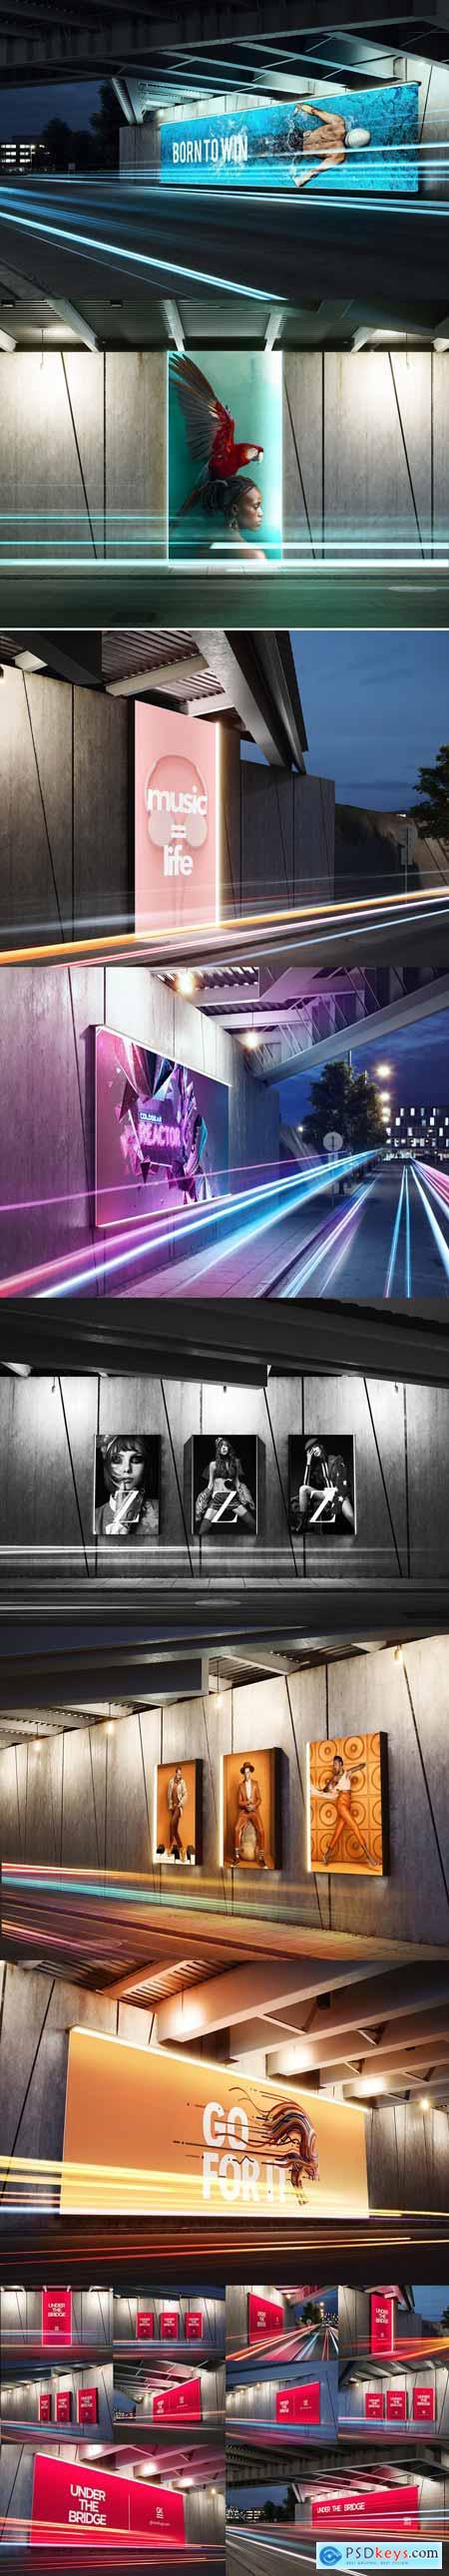 Under the Bridge - Billboard Mock-up 3400815